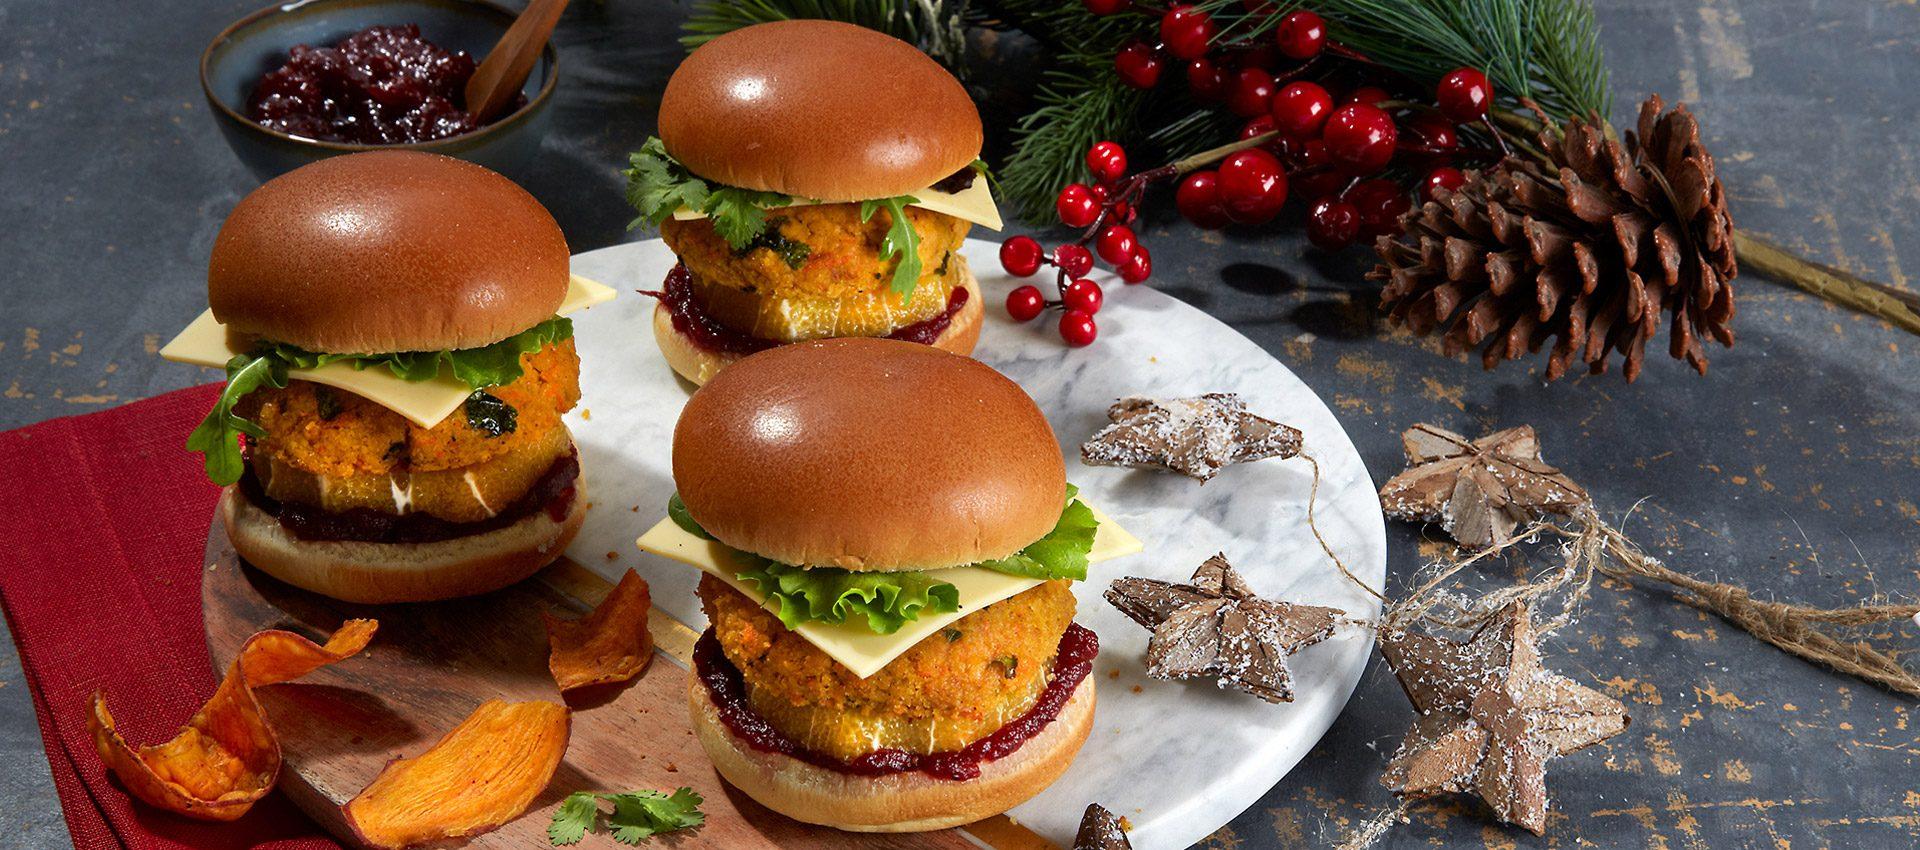 Christmas Lentil Burgers with Violife Slices Original